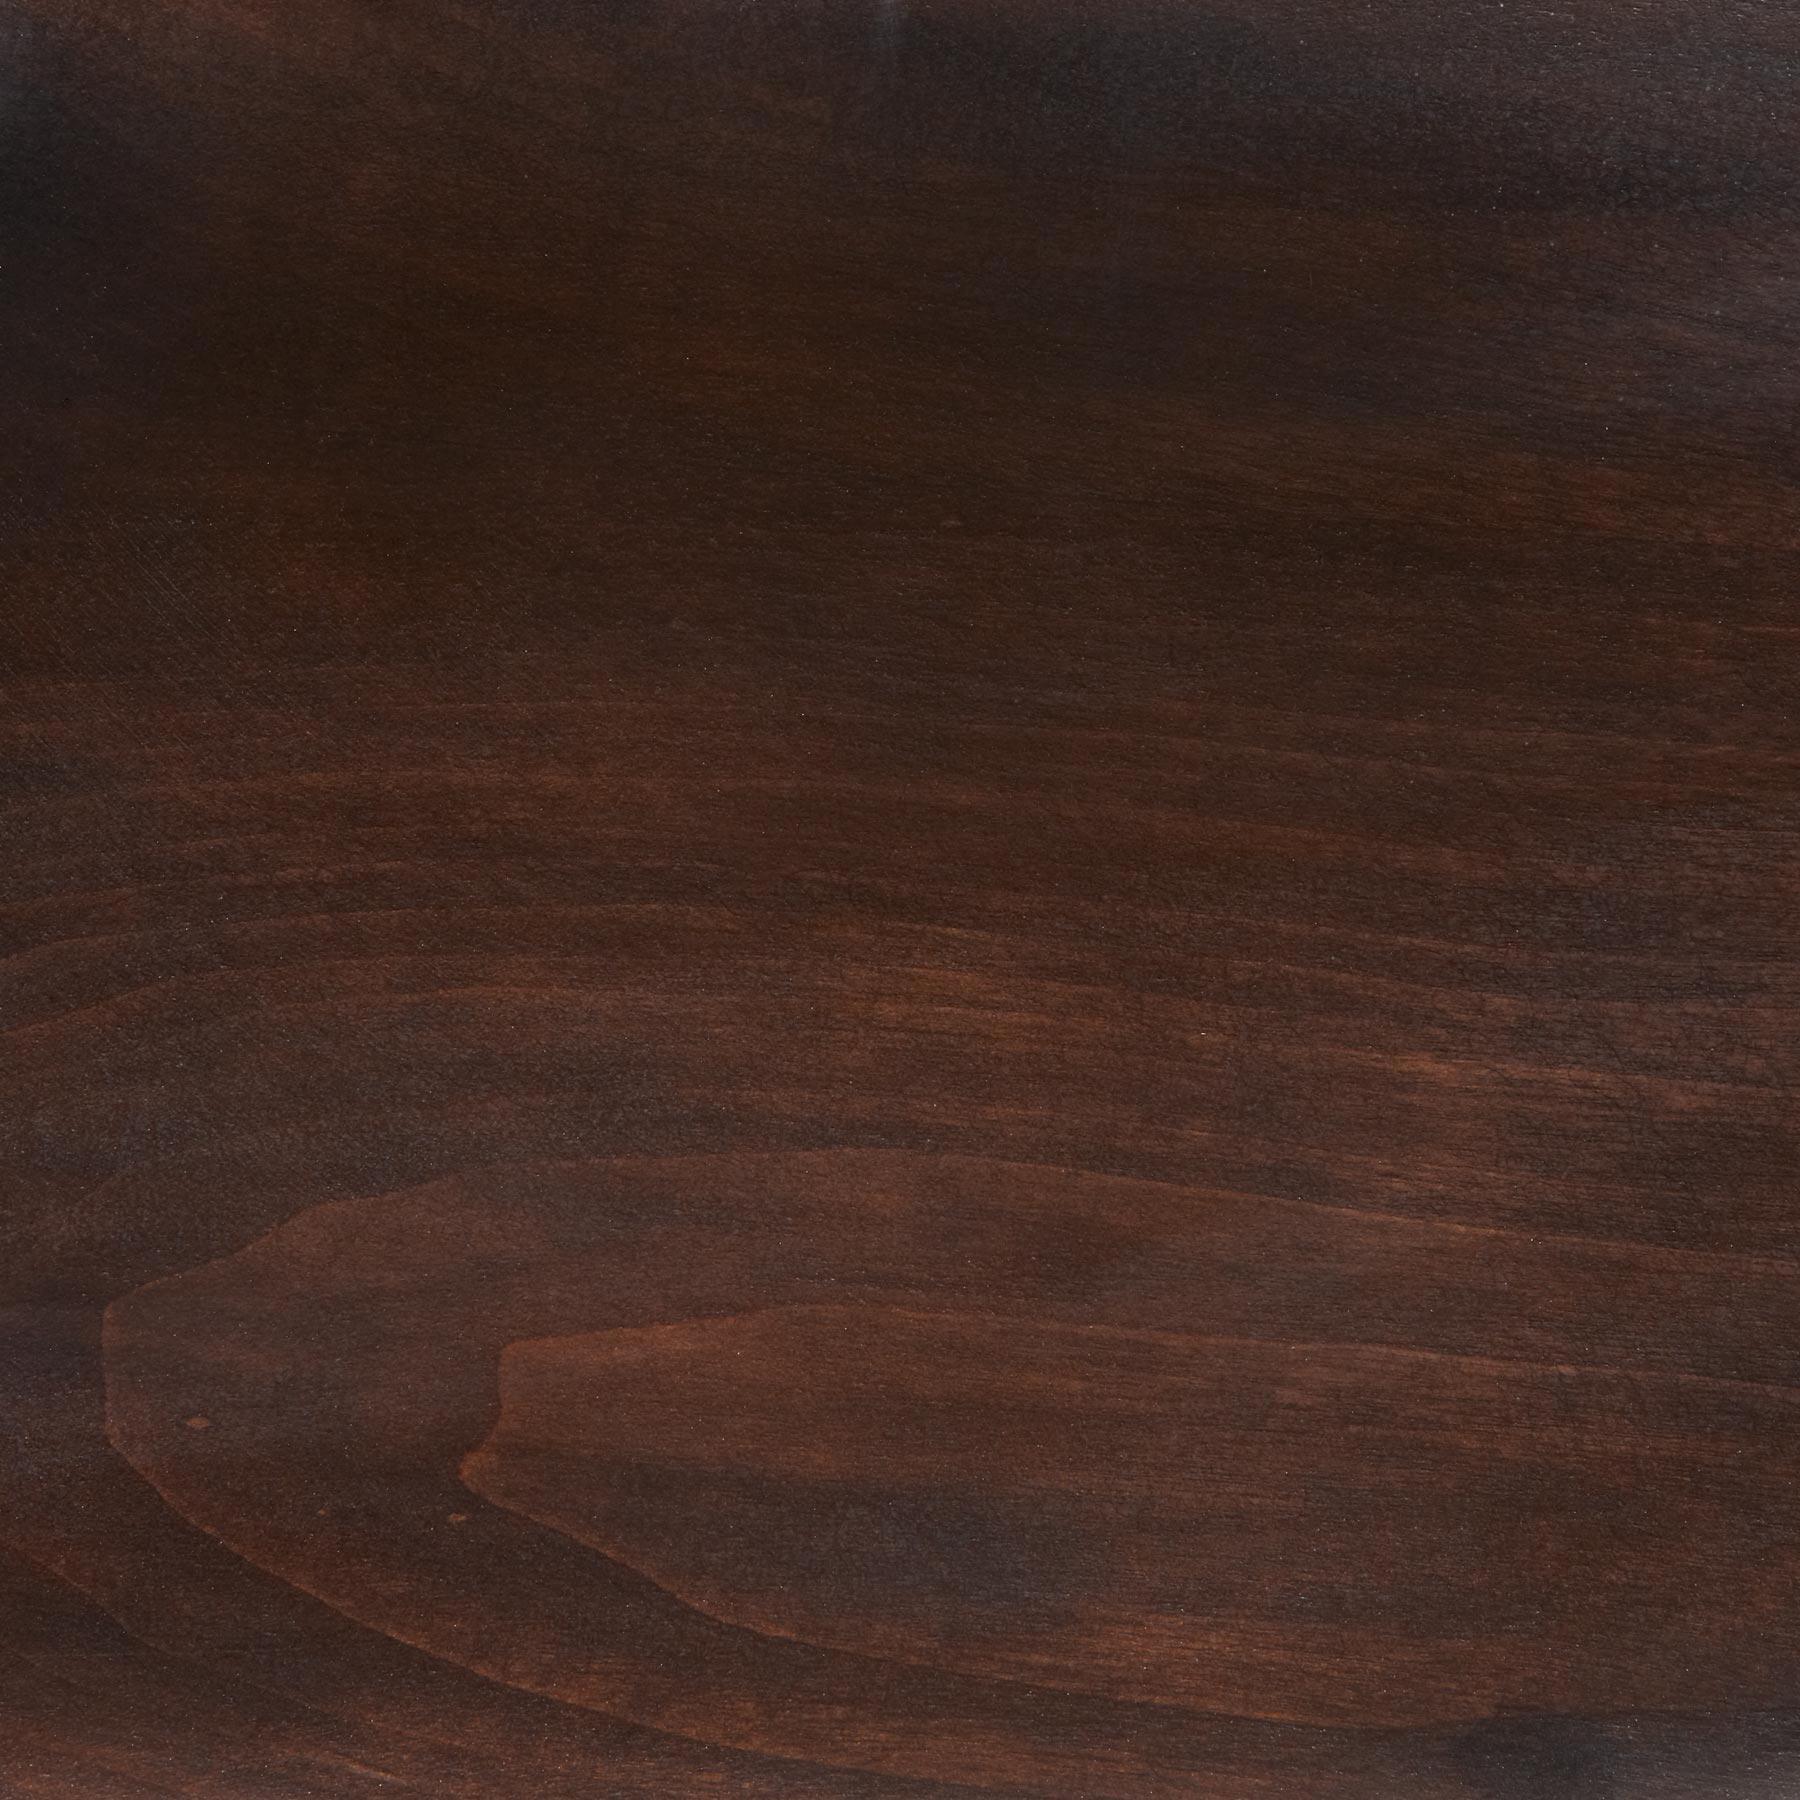 SOHO ADJUSTABLE STOOL: View 5